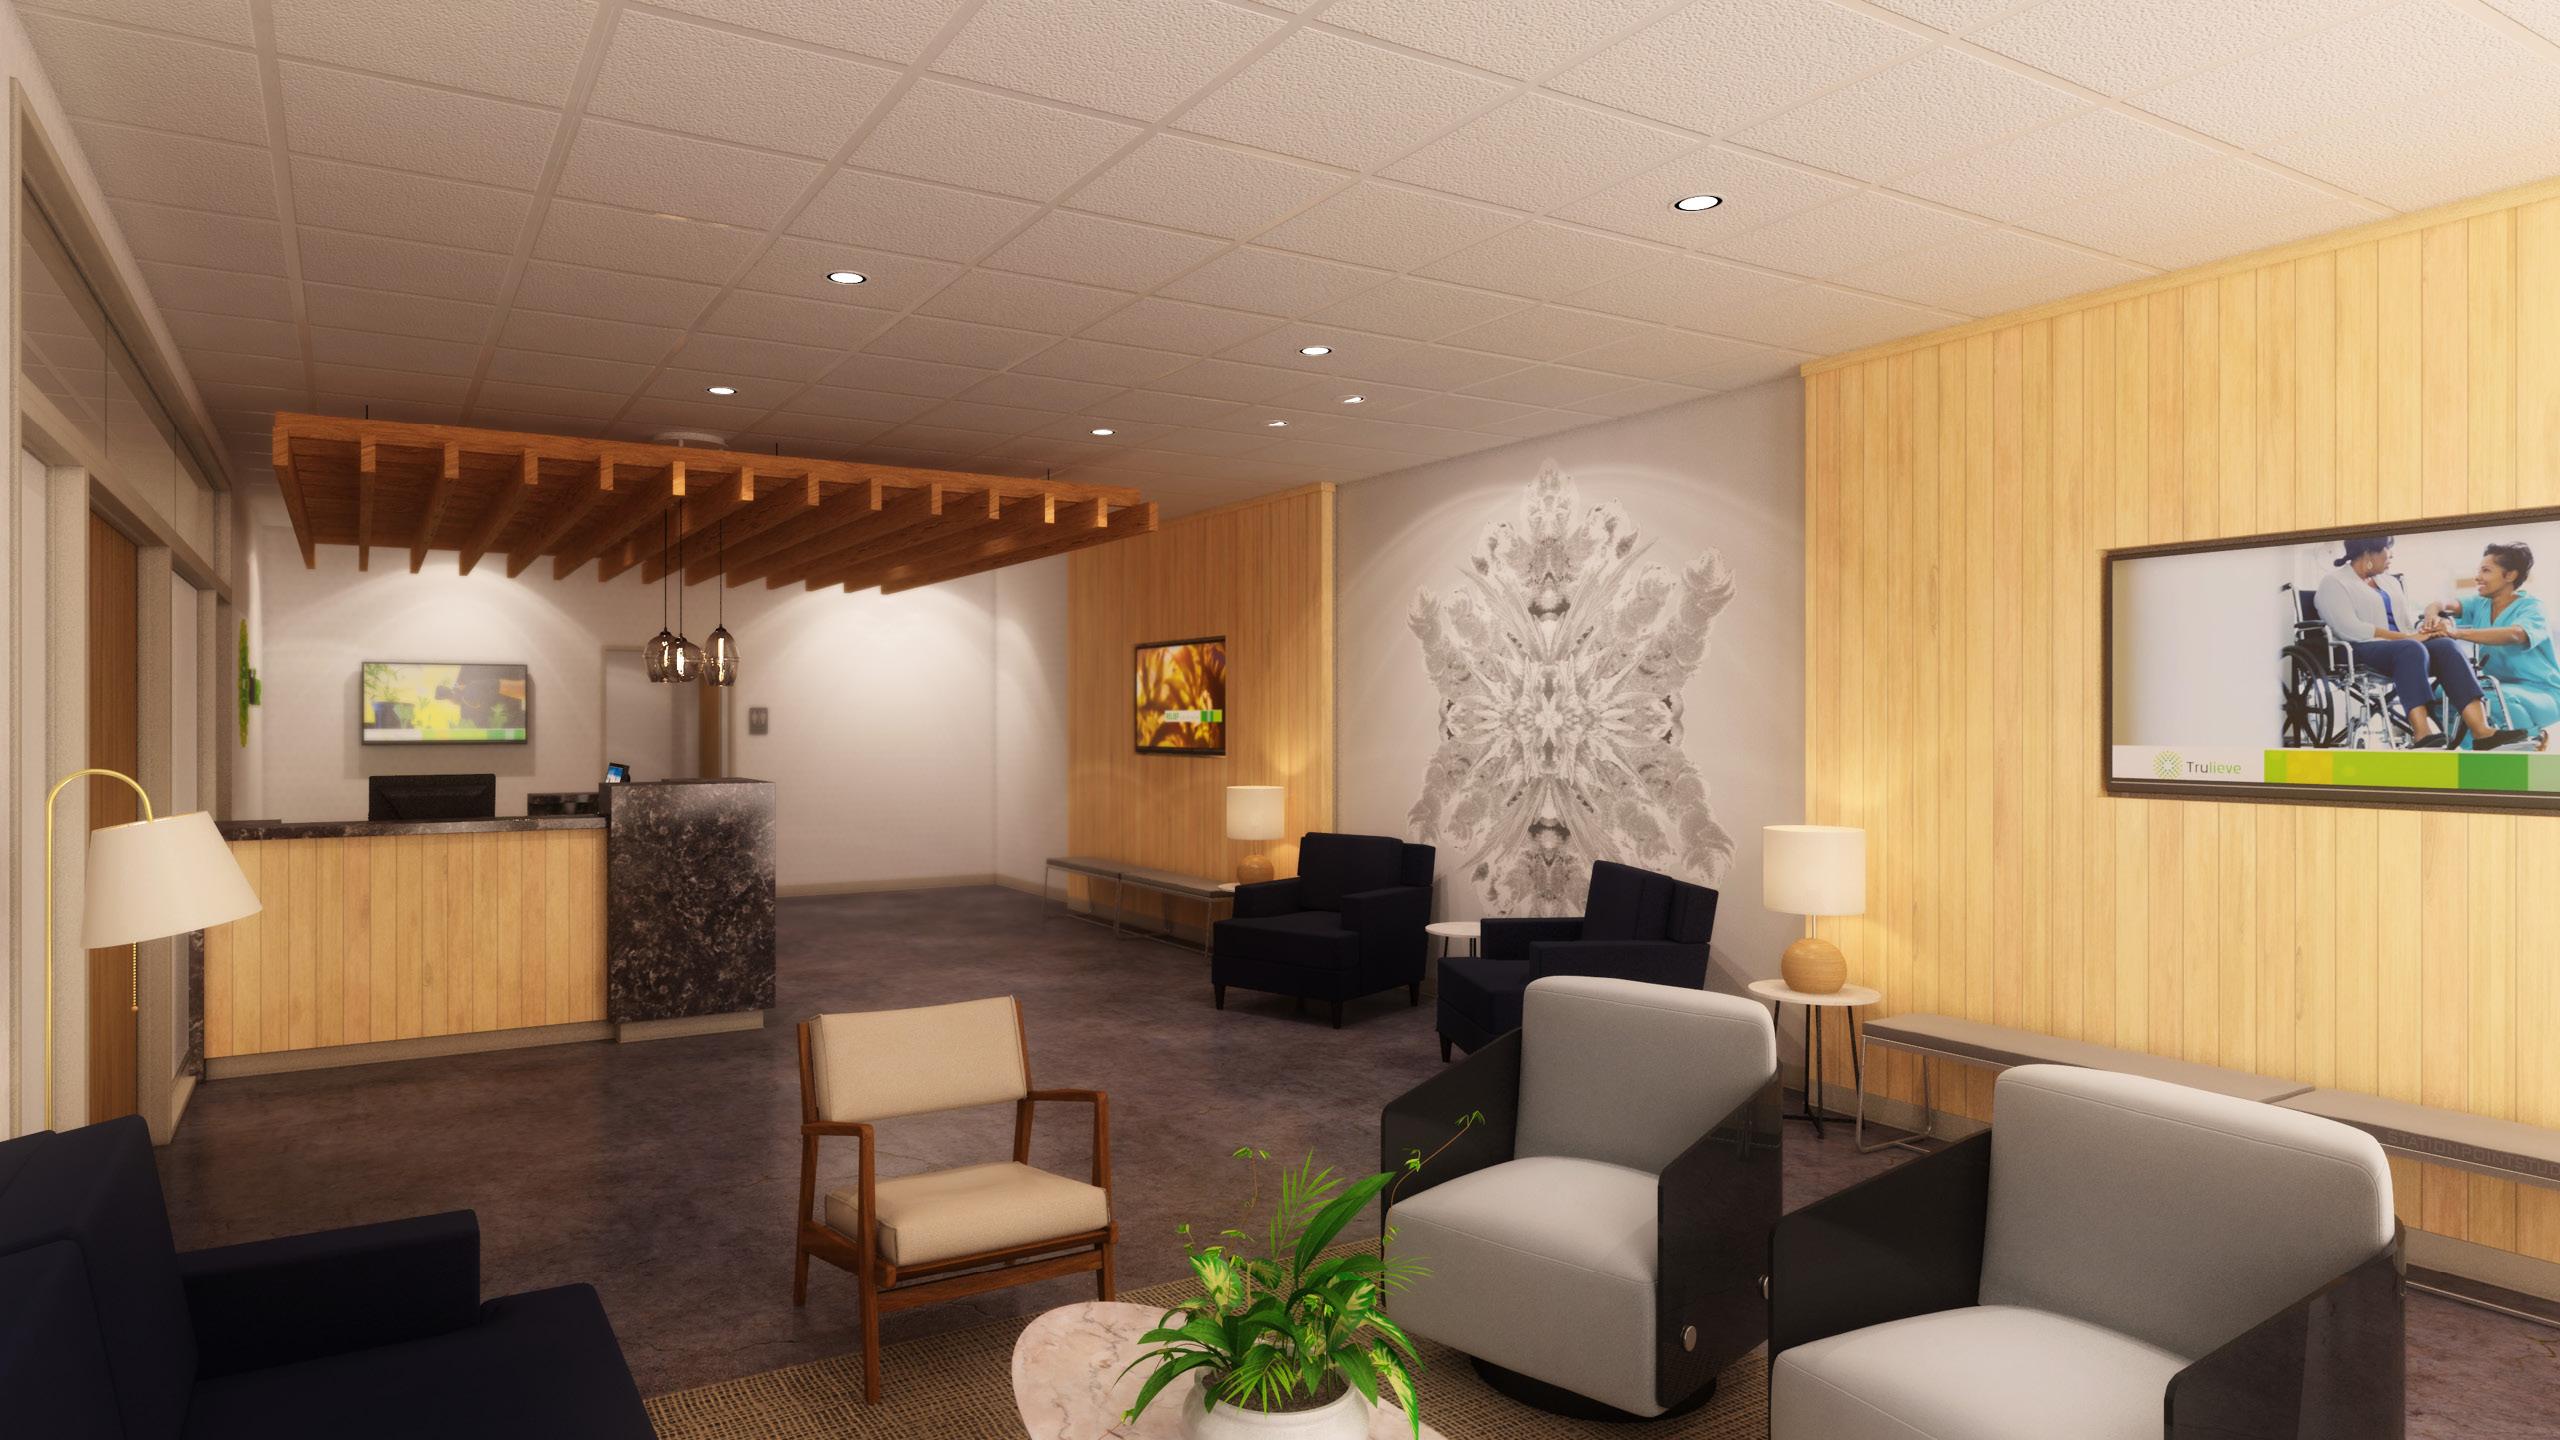 Trulieve Dispensary Interior Design by High Road Design Studio